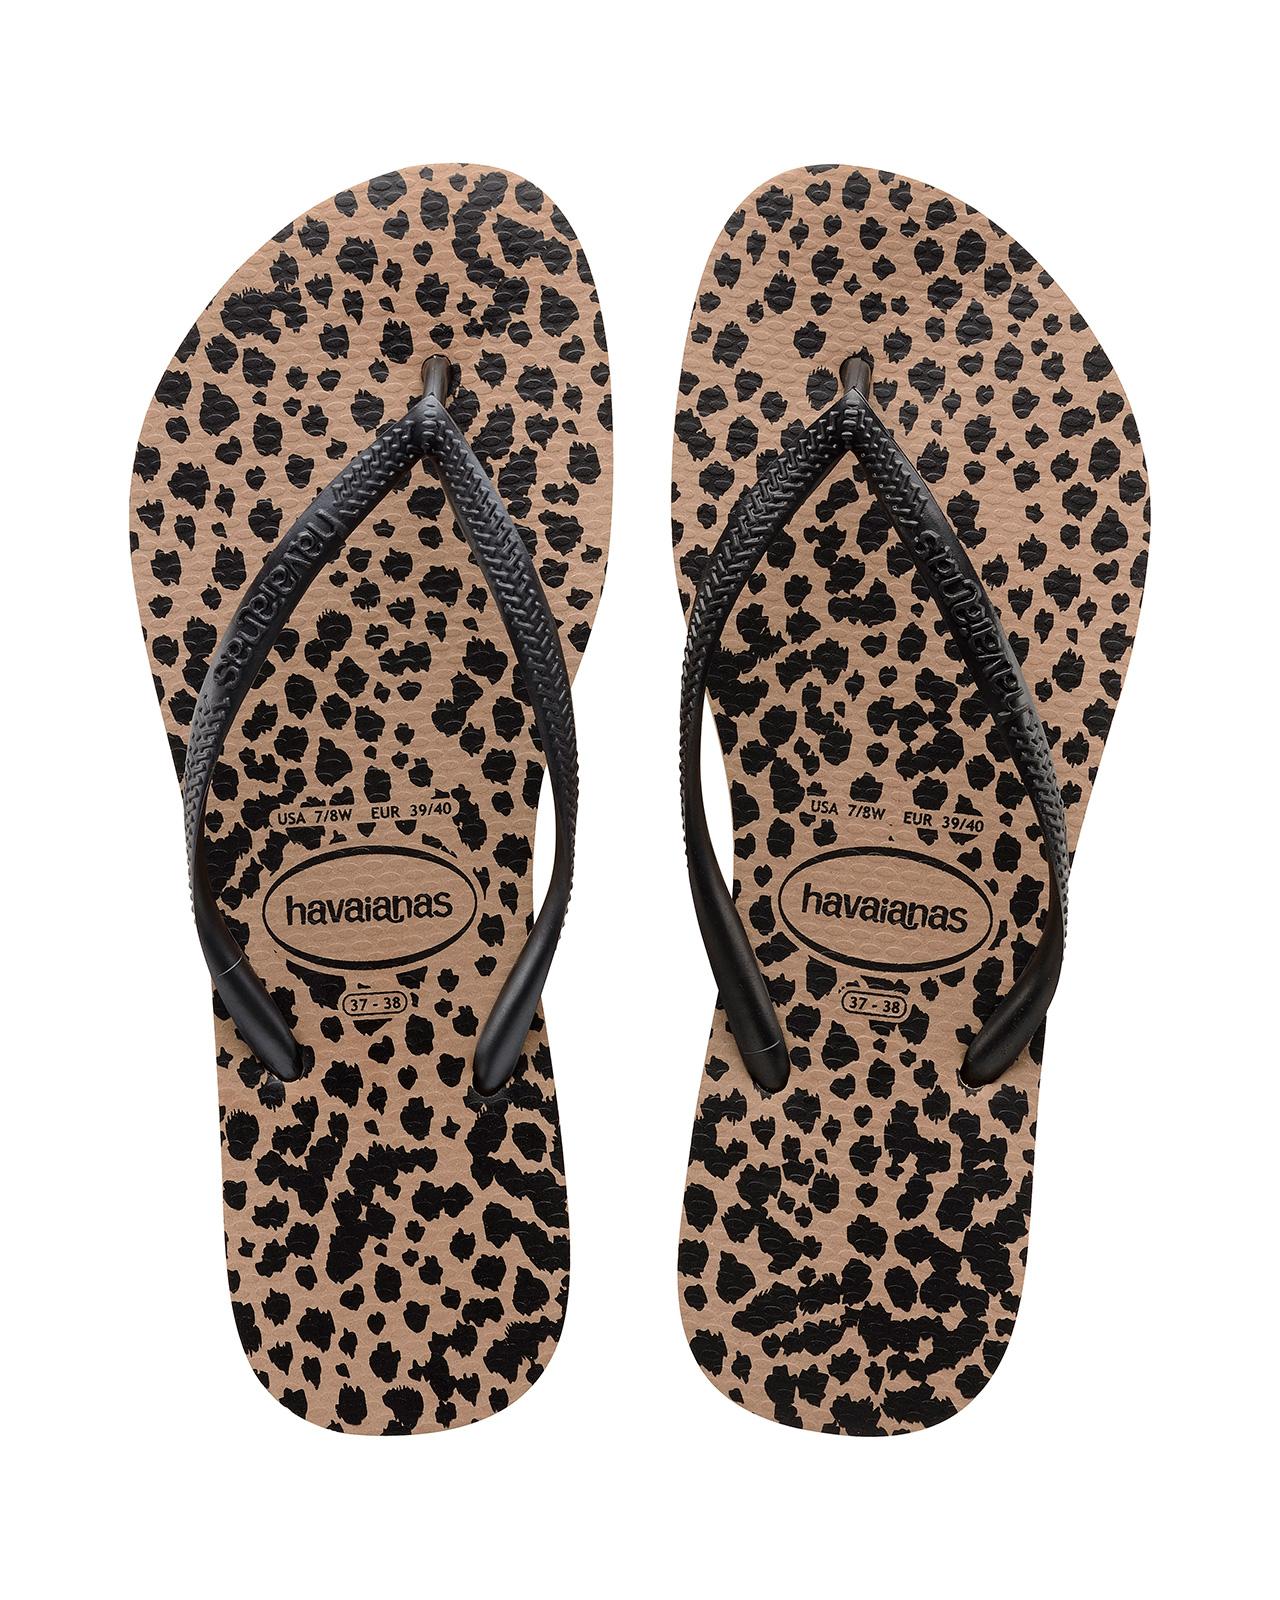 0618754251910 Flip-Flops Flip-flops - Havaianas Slim Animals Rose Gold black